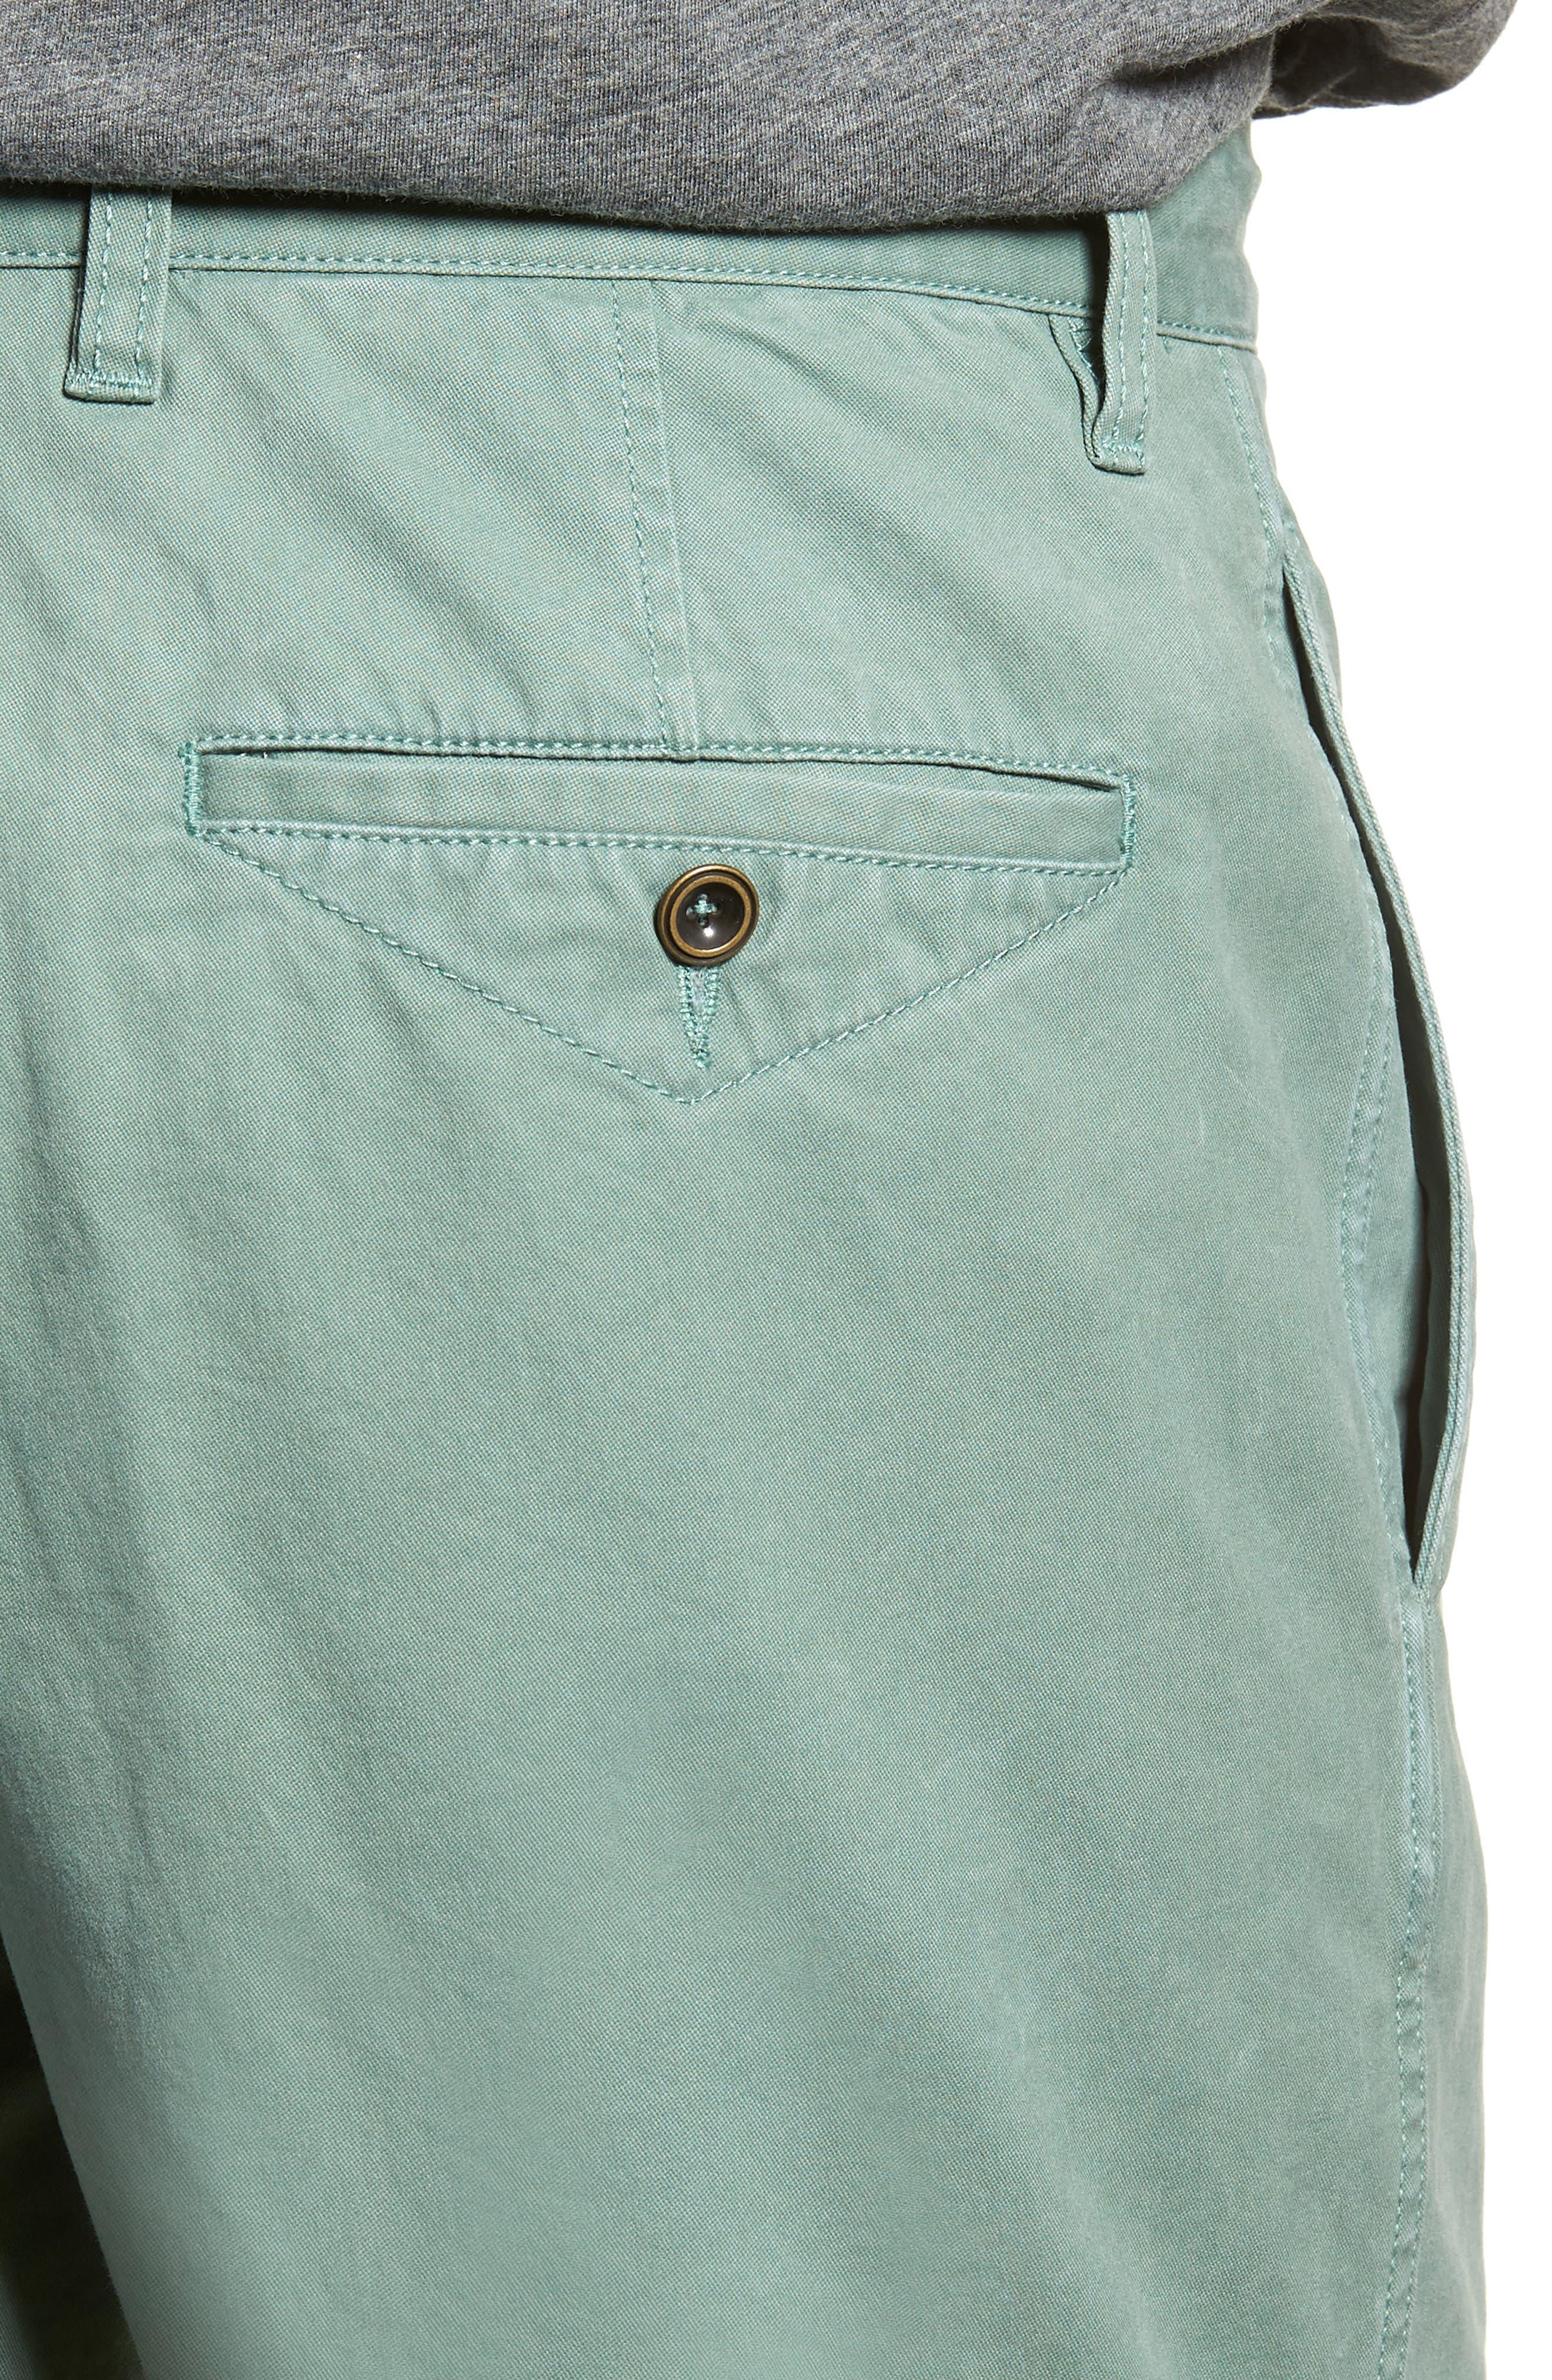 Glenburn Shorts,                             Alternate thumbnail 4, color,                             SAGE